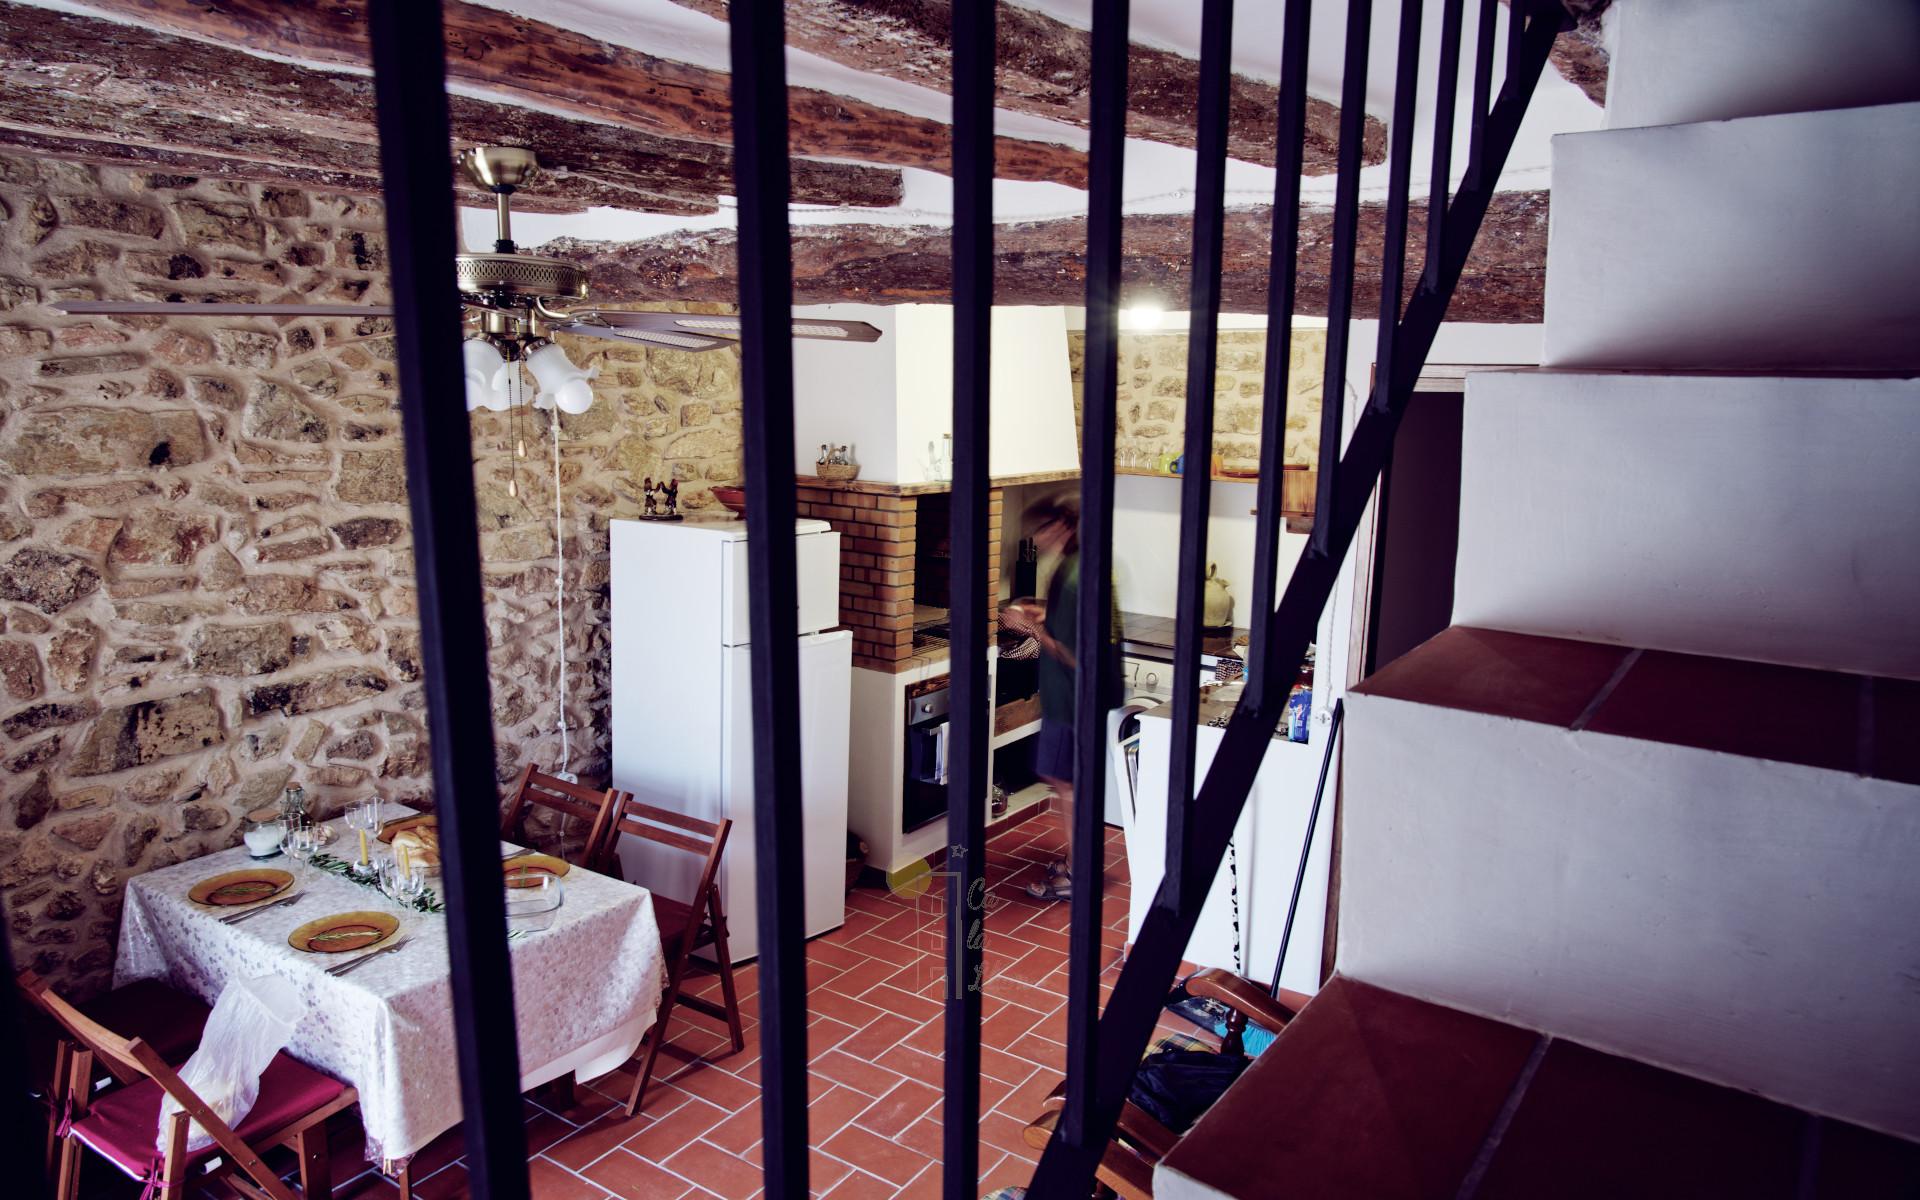 Salón comedor de Ca la Llum, la casa más acogedora de Tivissa